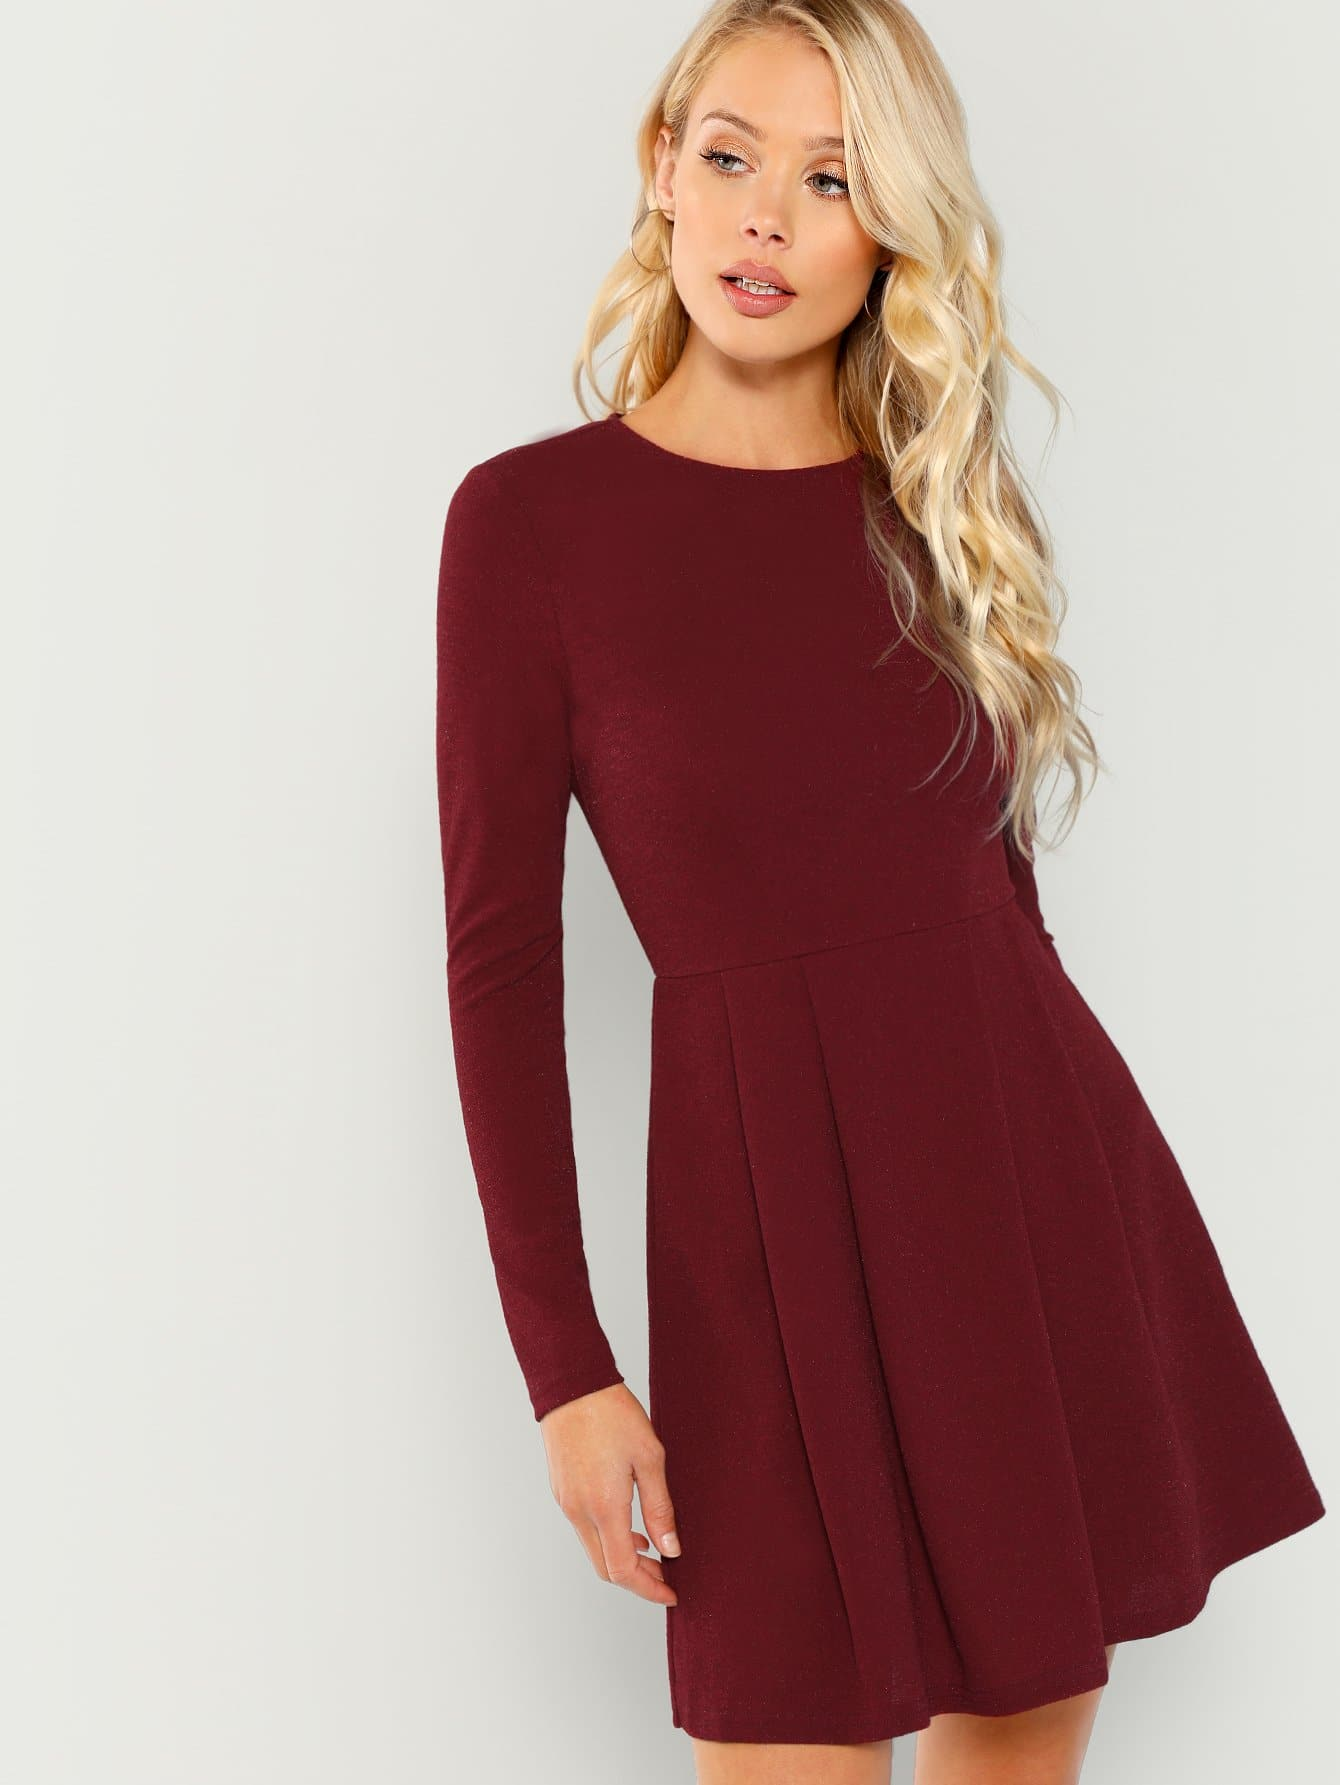 Купить Тверное платье-клёш, Allie Leggett, SheIn